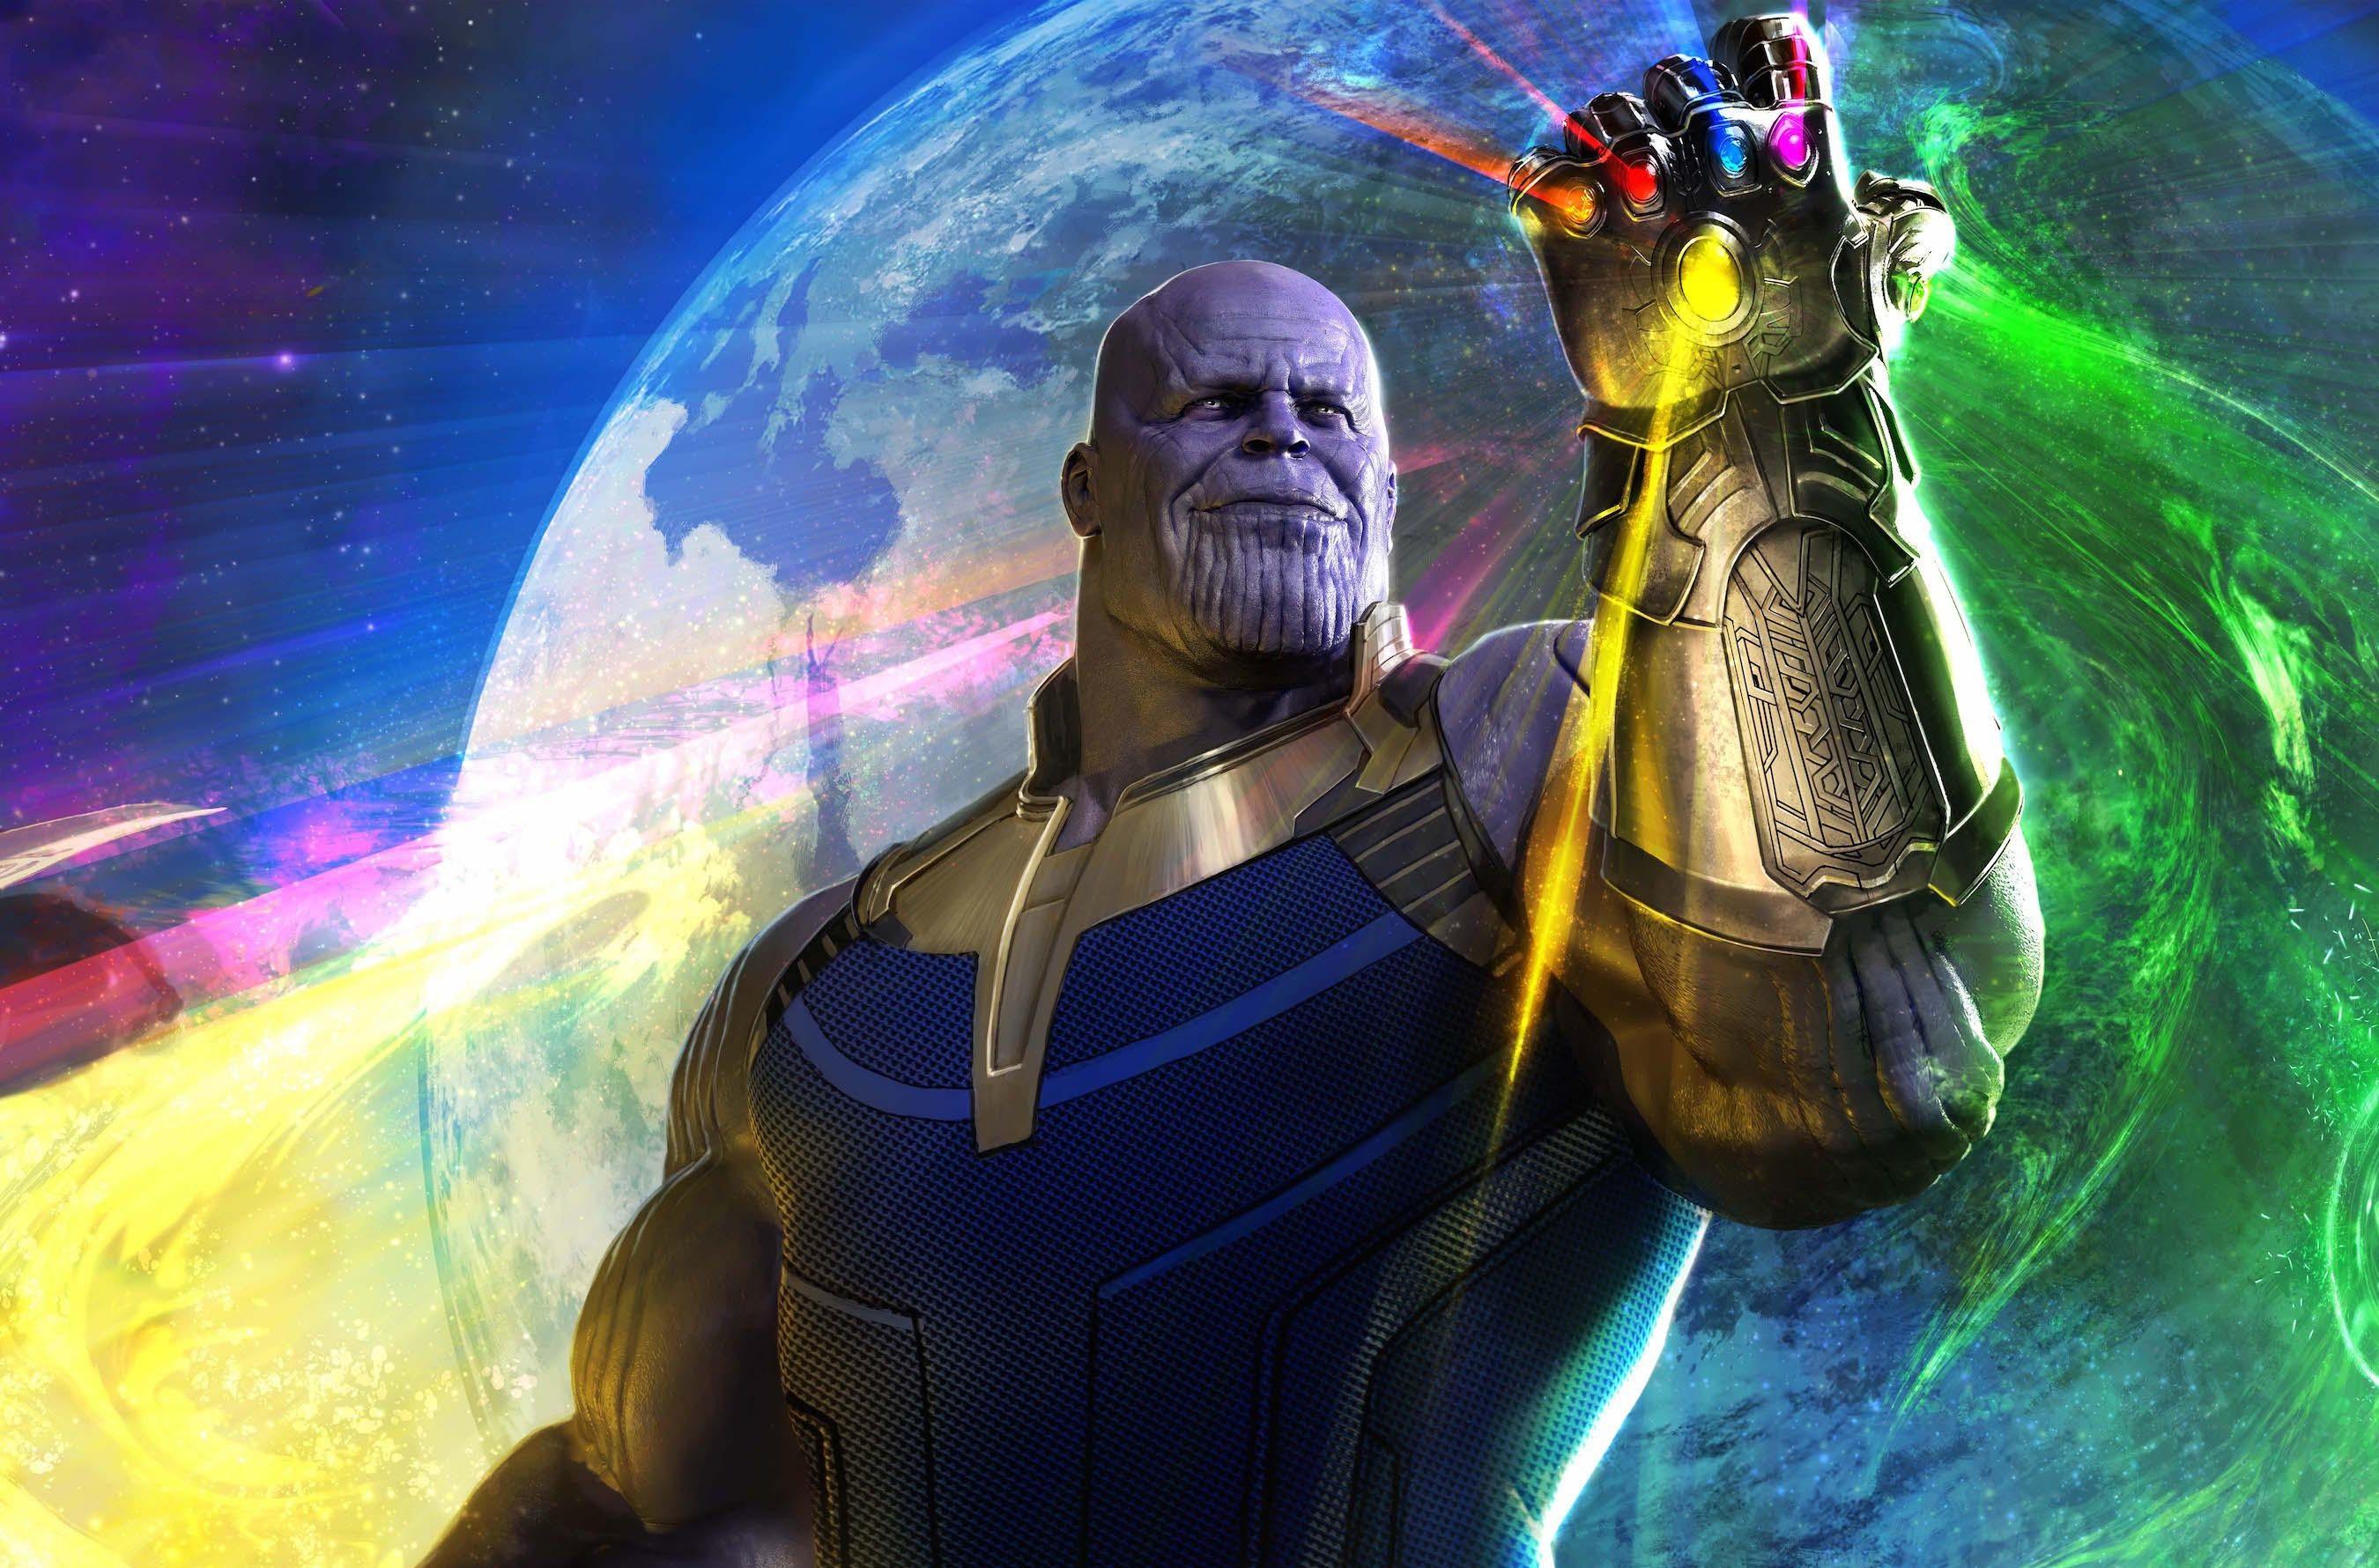 10 New Avengers Infinity War Desktop Wallpaper Full Hd: Thanos In Avengers Infinity War, Full HD 2K Wallpaper